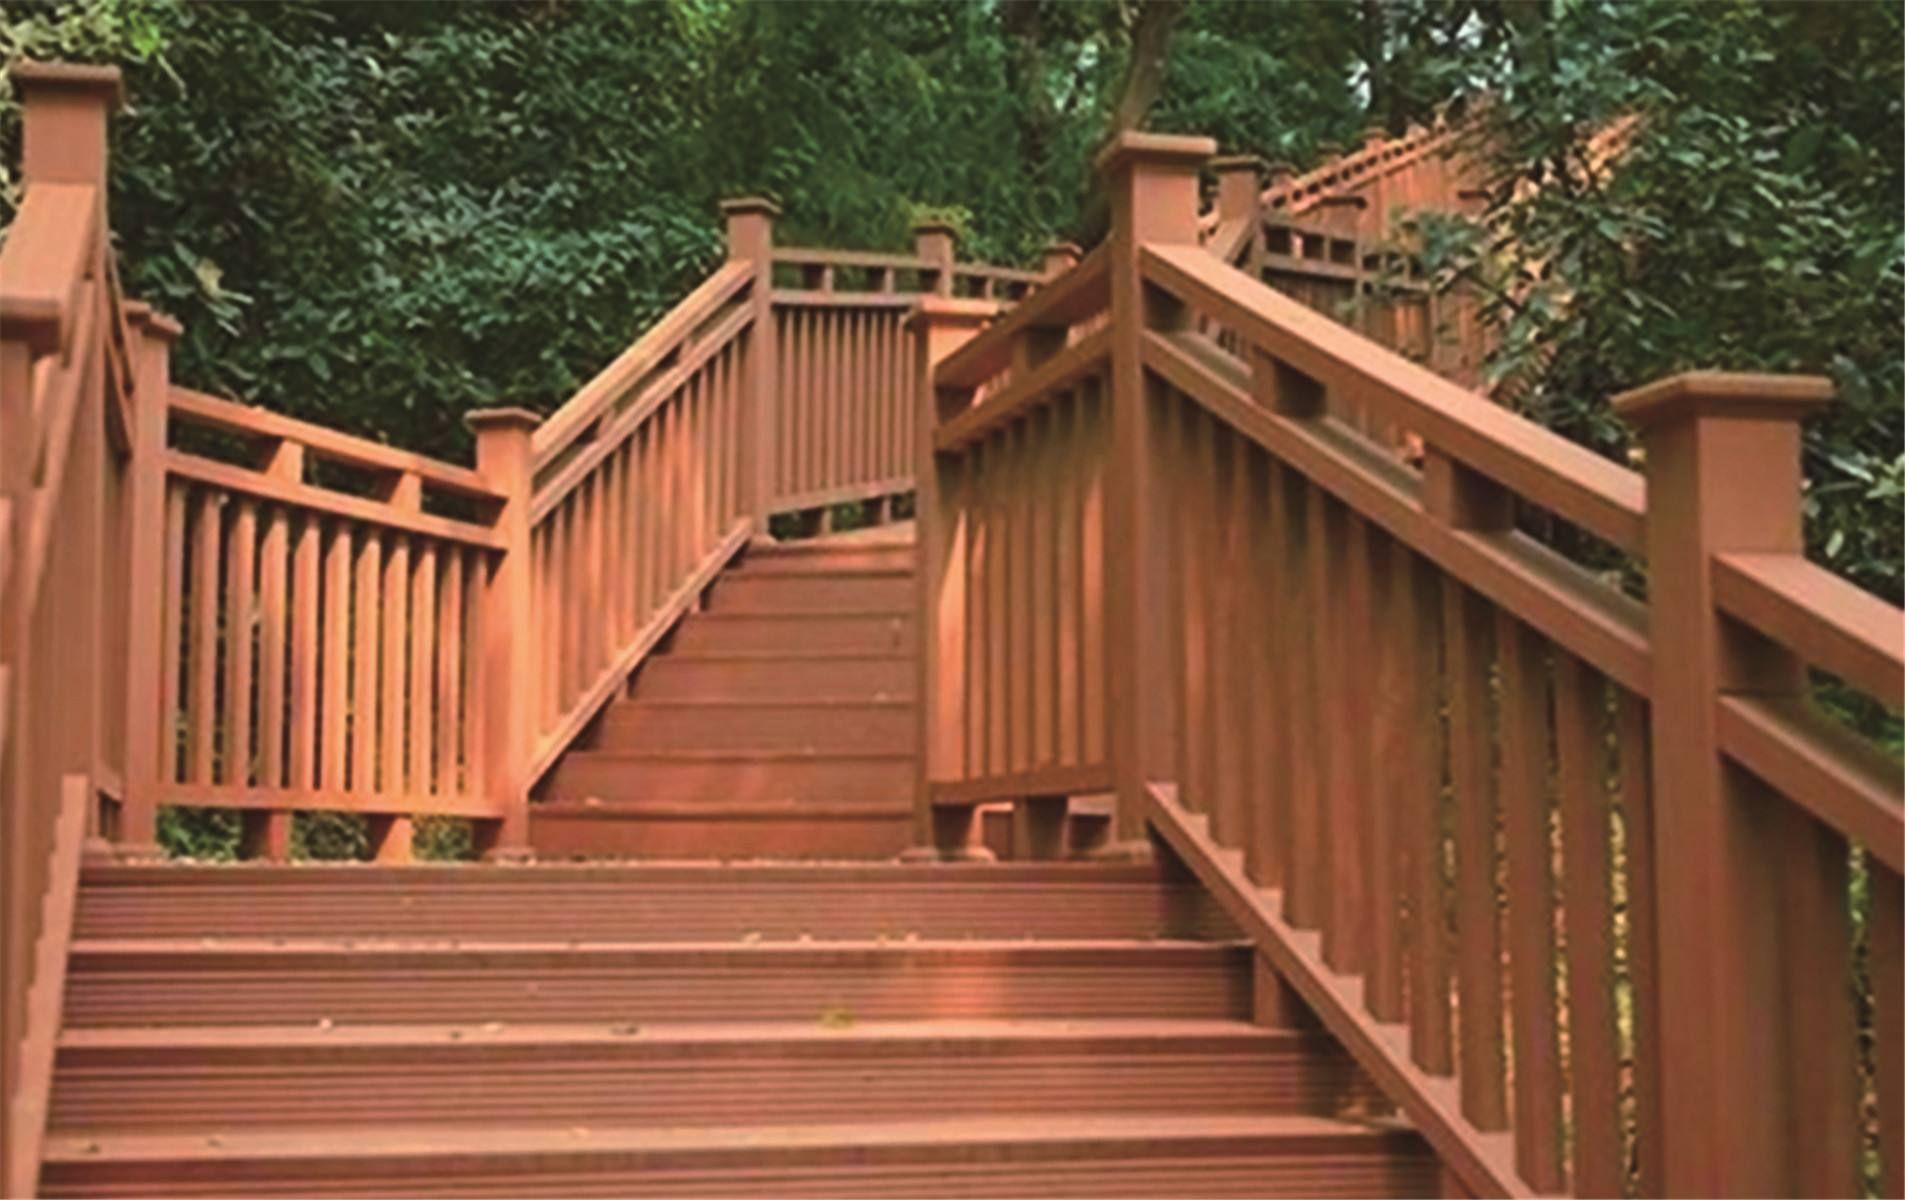 Patio Deck Cost Per Square Foot Price Deck Building Cost Deck Building A Deck